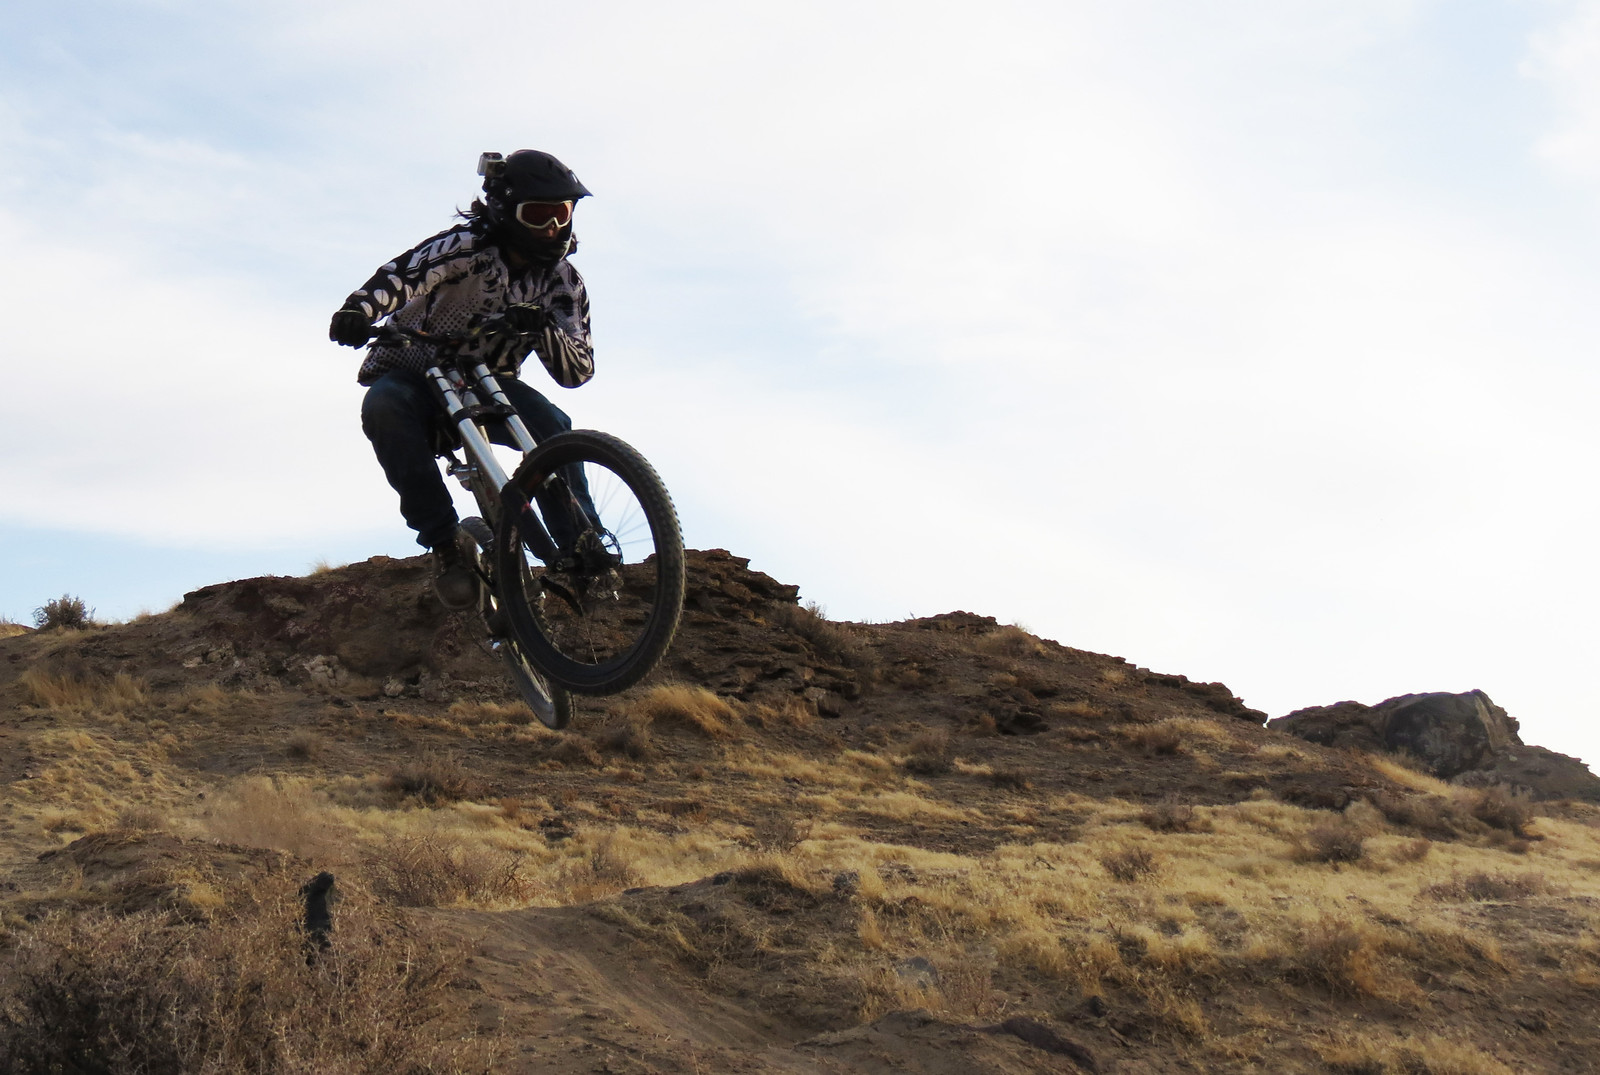 Cim Whip - Moosey - Mountain Biking Pictures - Vital MTB